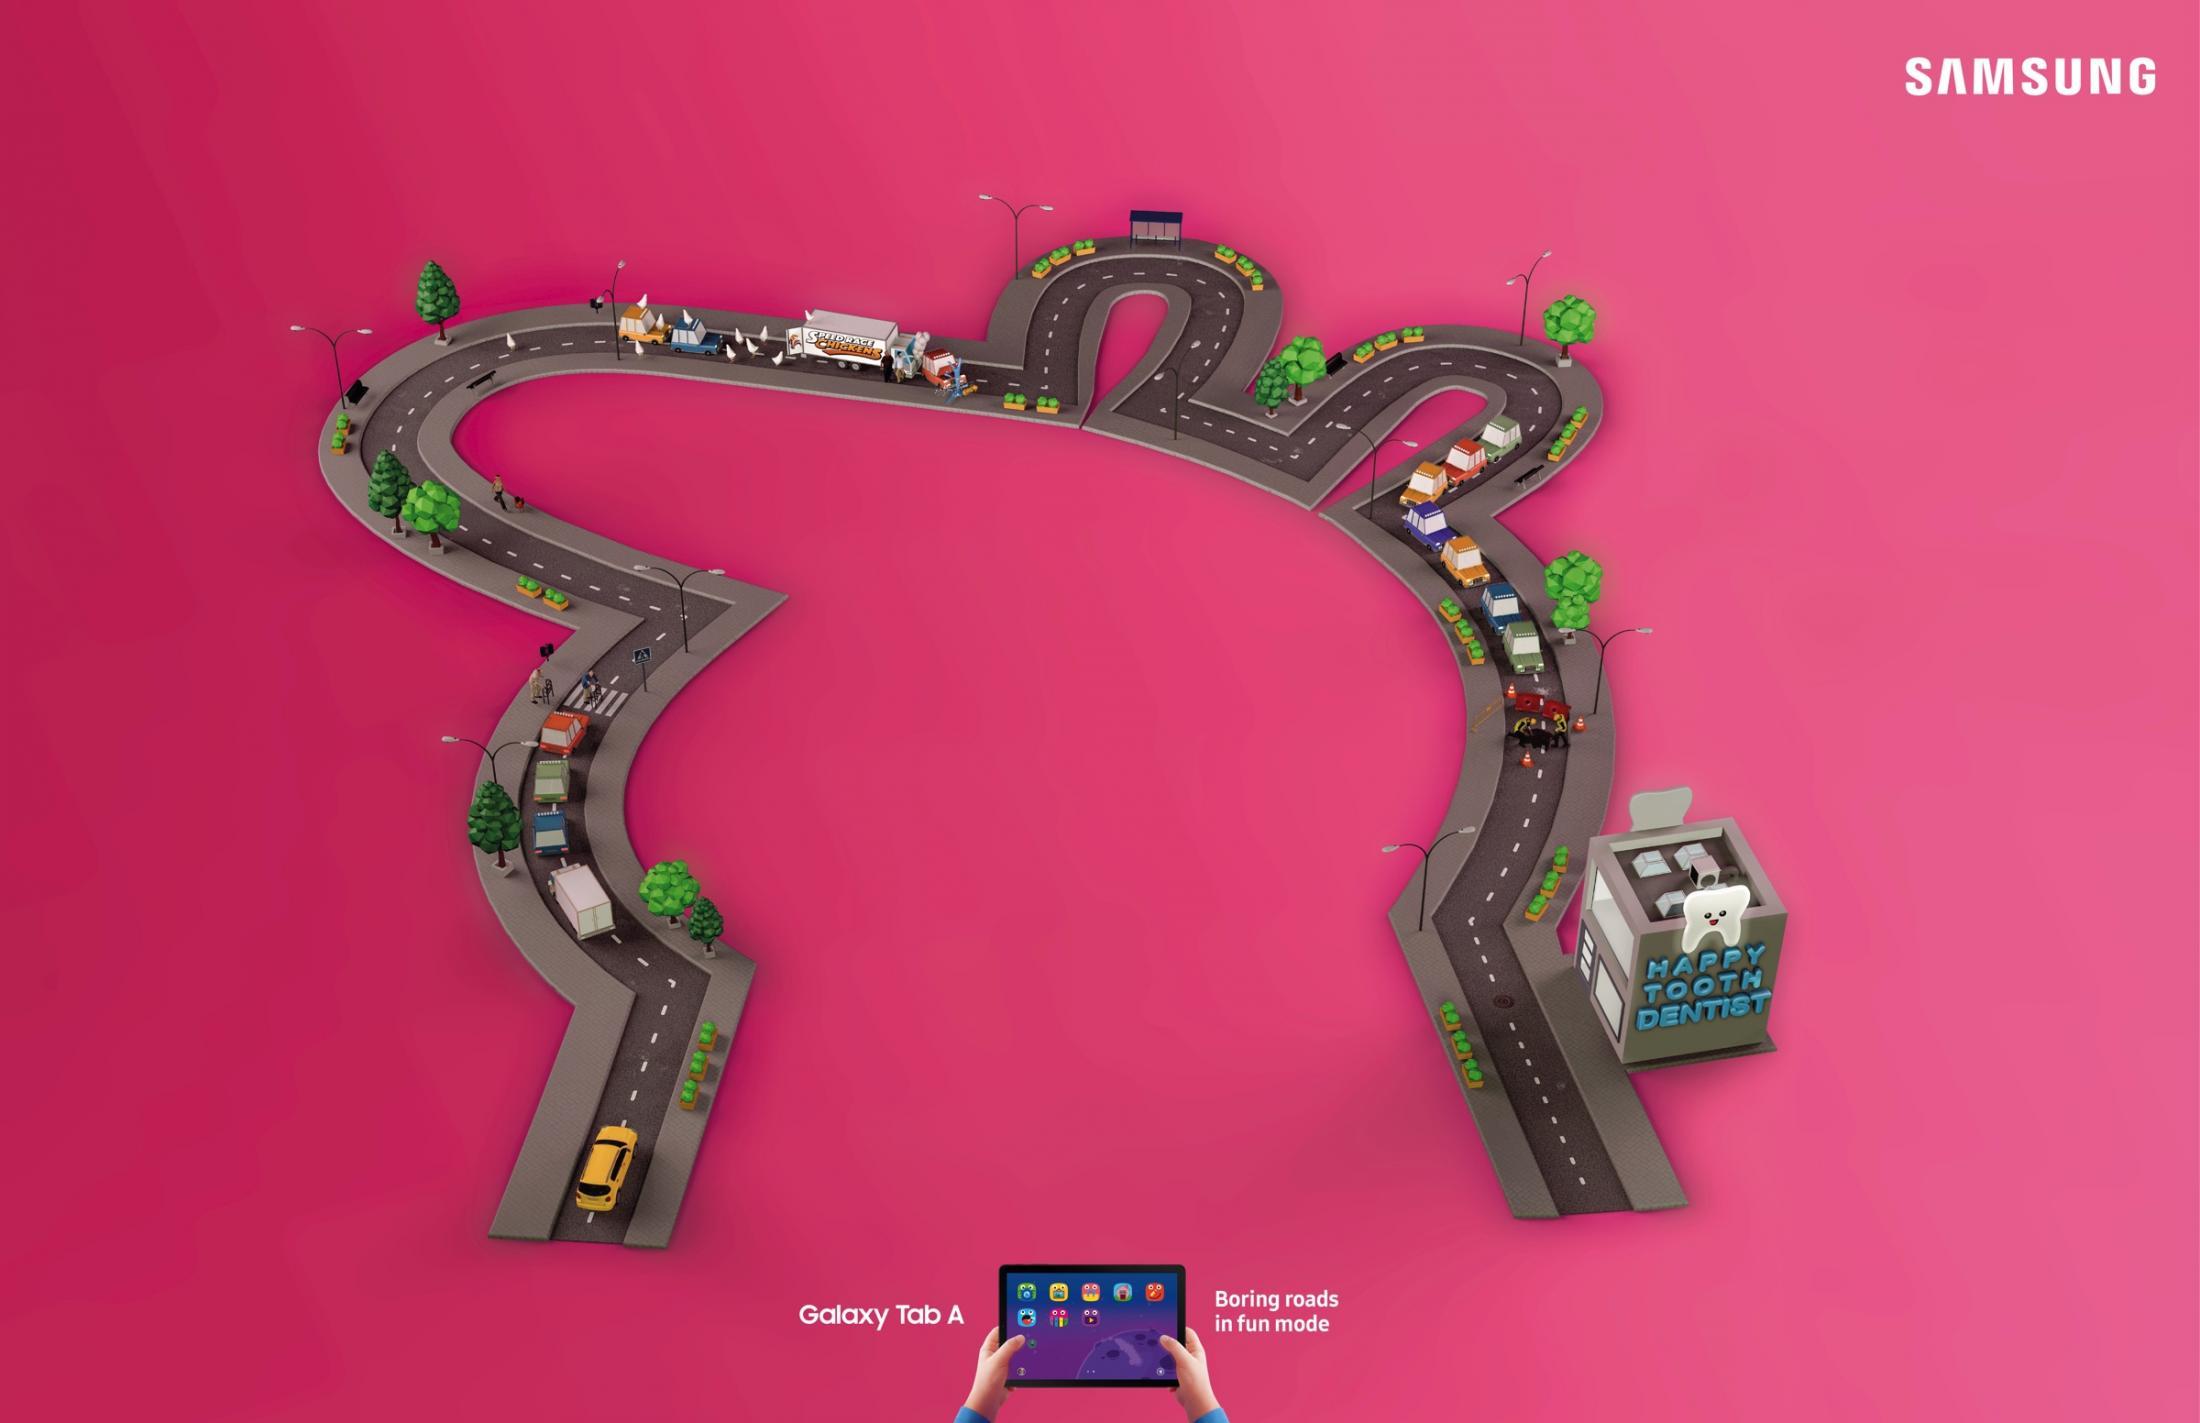 Samsung Print Ad - Funny Roads, 1